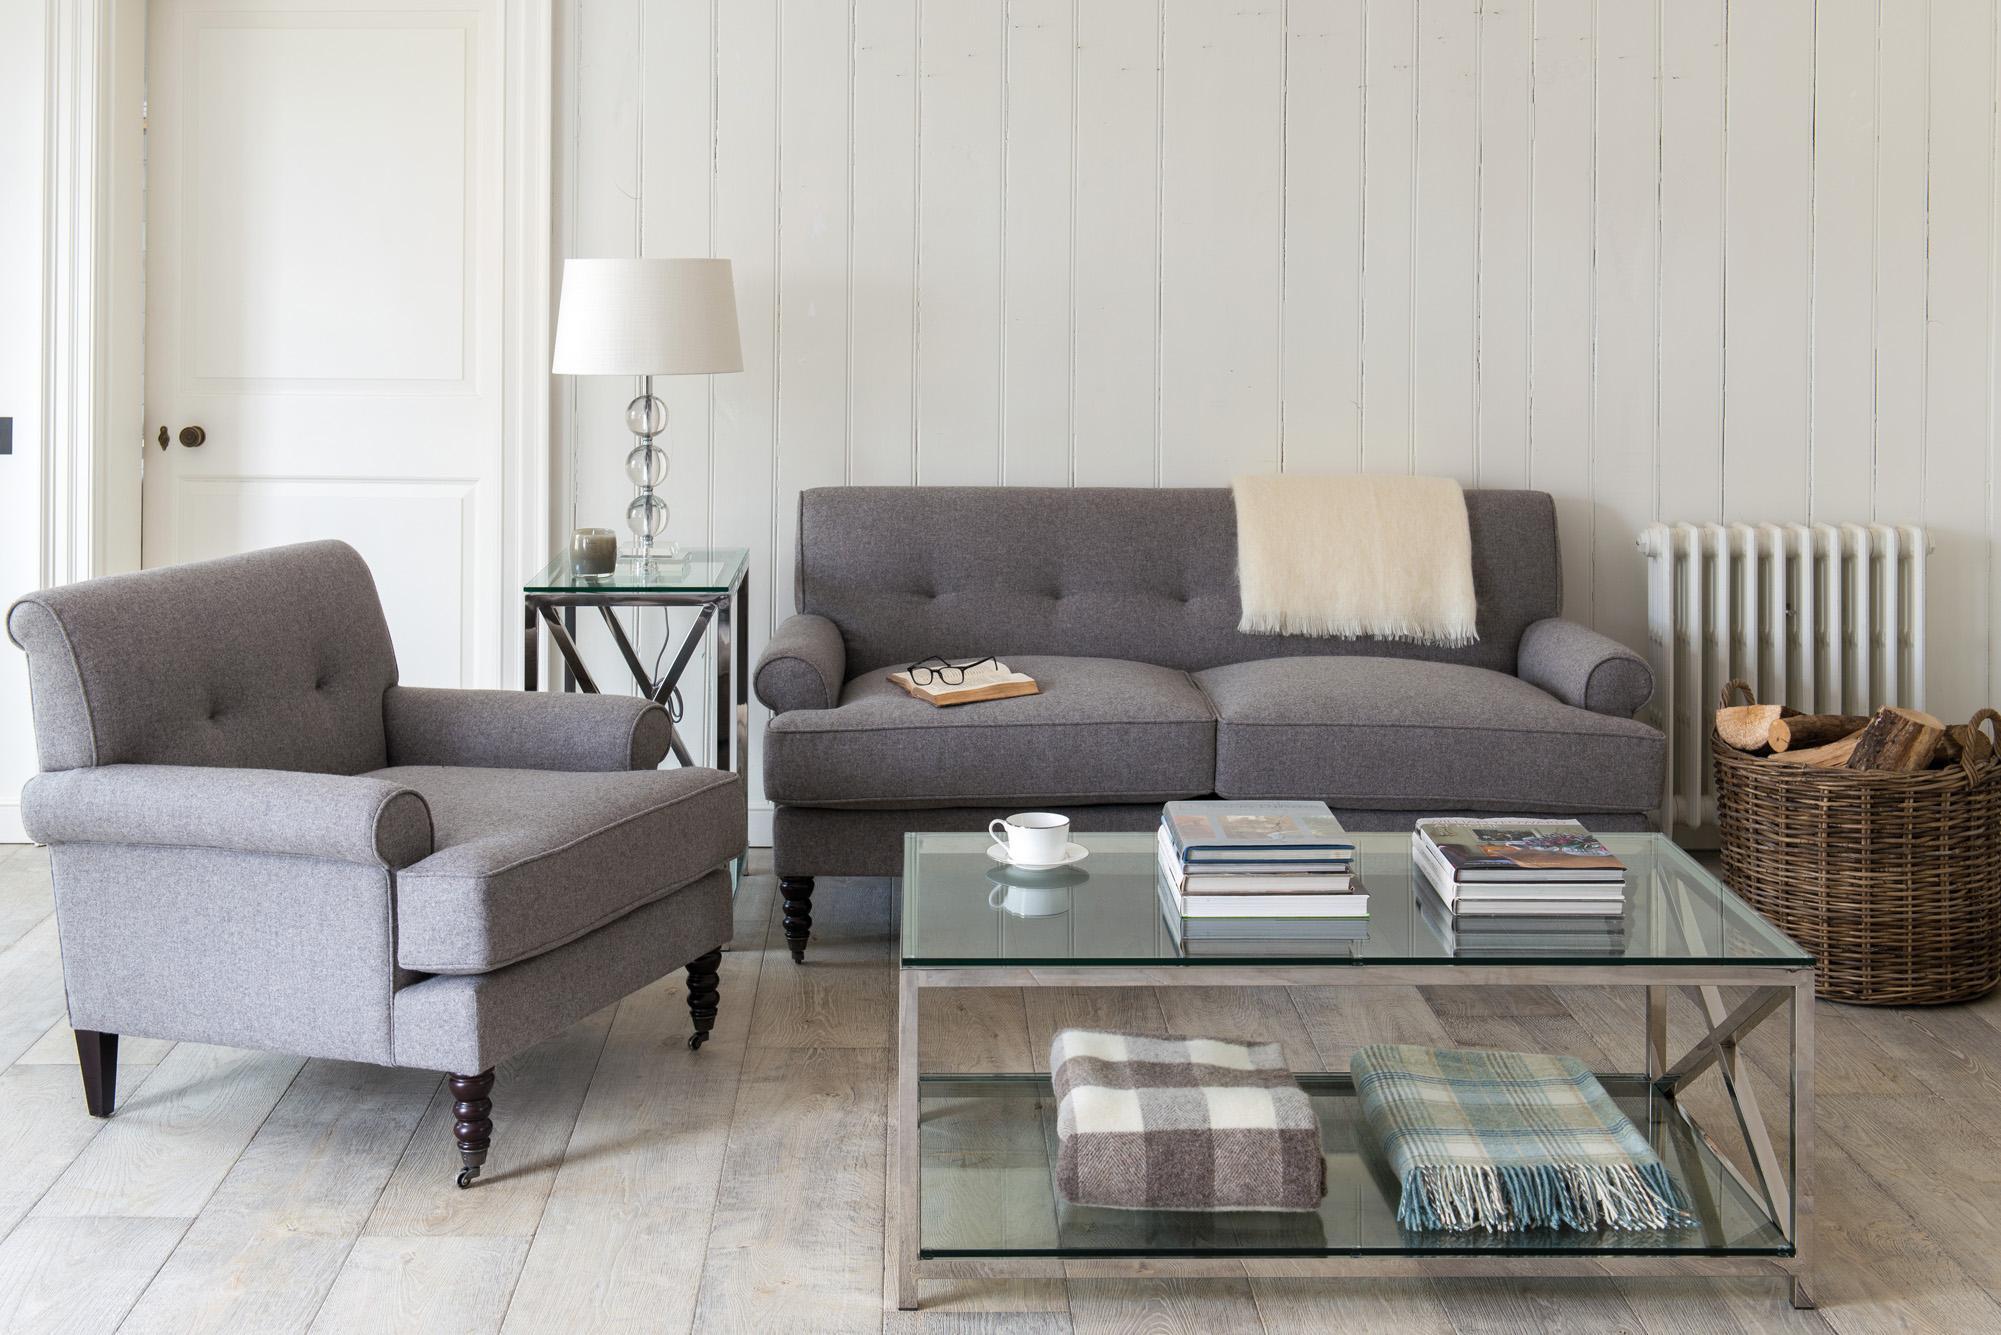 holzwand bilder ideen couchstyle. Black Bedroom Furniture Sets. Home Design Ideas